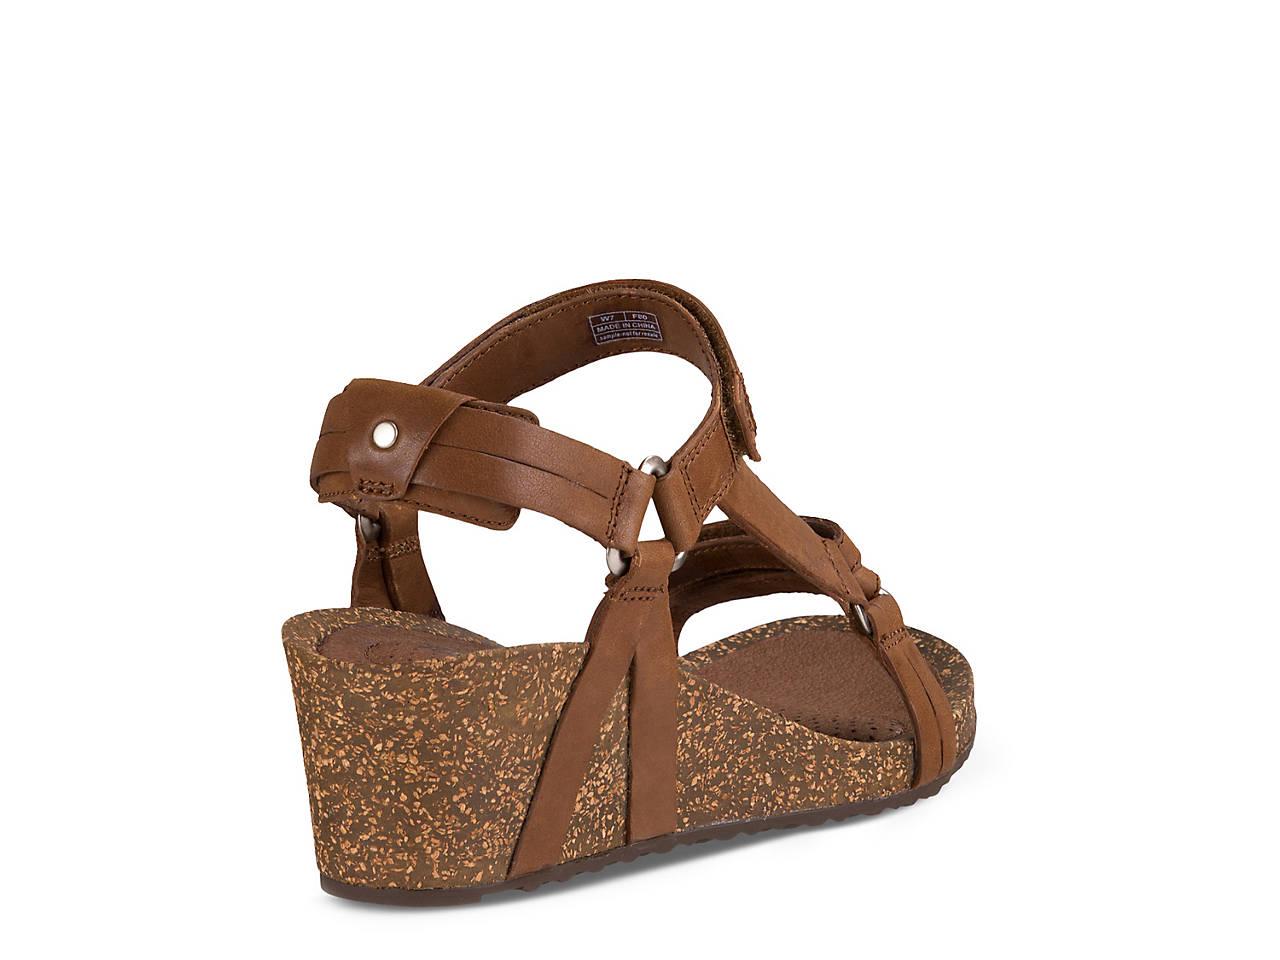 398d7c810 Teva Ysidro Wedge Sandal Women s Shoes